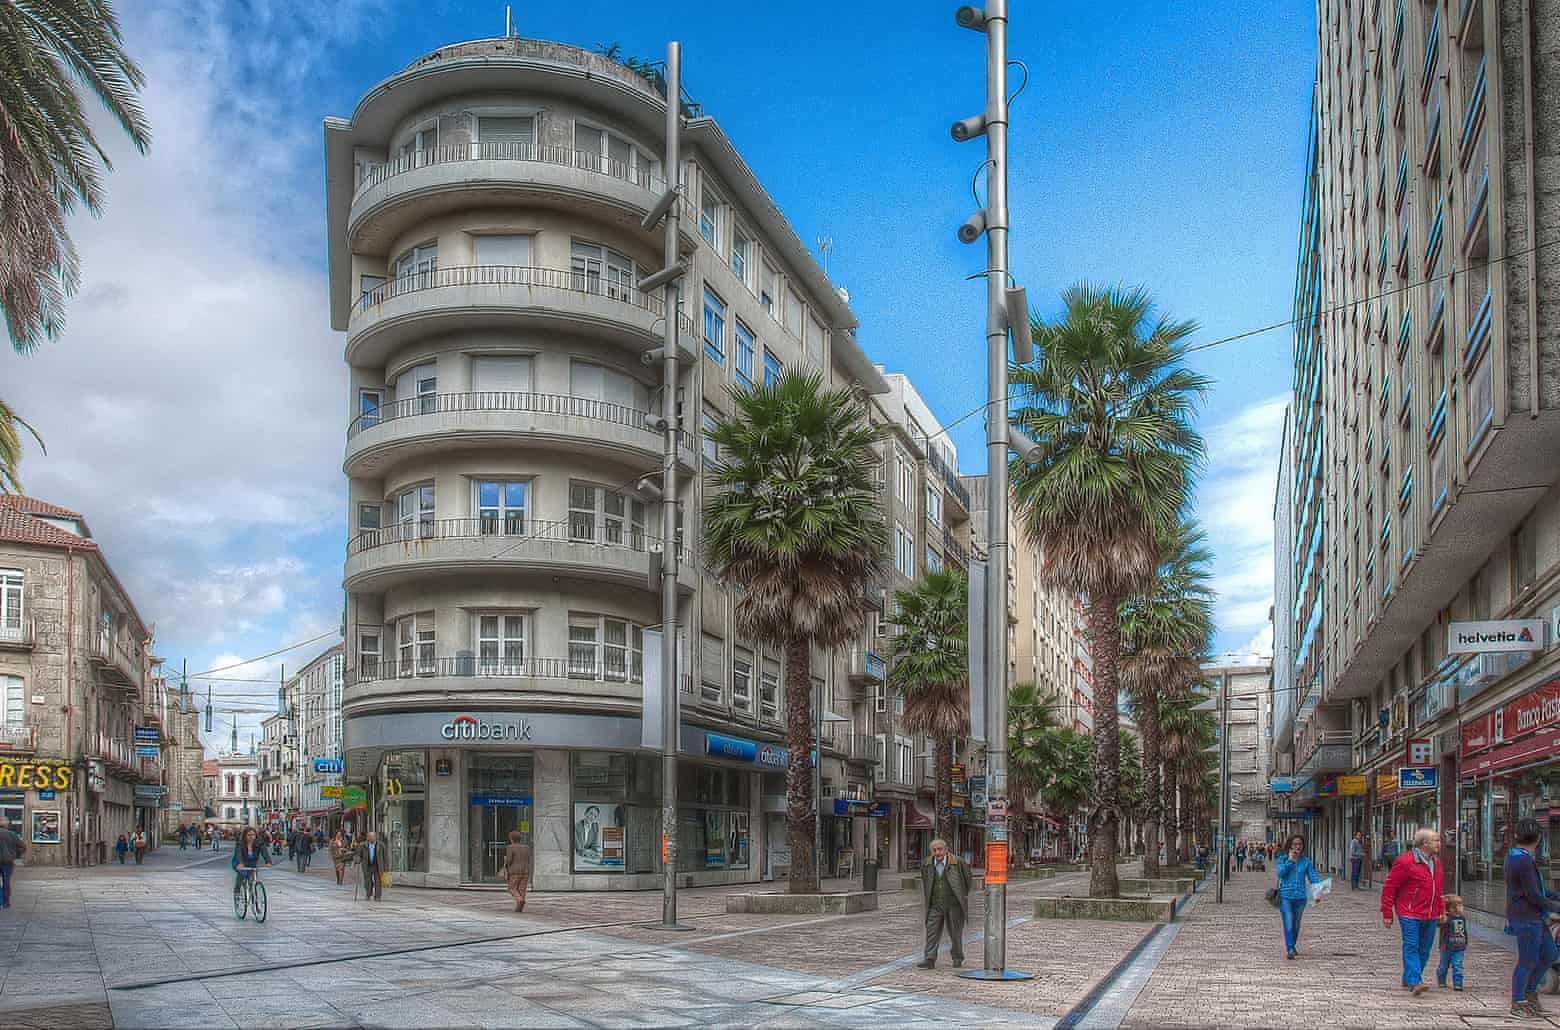 Central Pontevedra after the changes. Photograph: Luis Pereiro Gomez